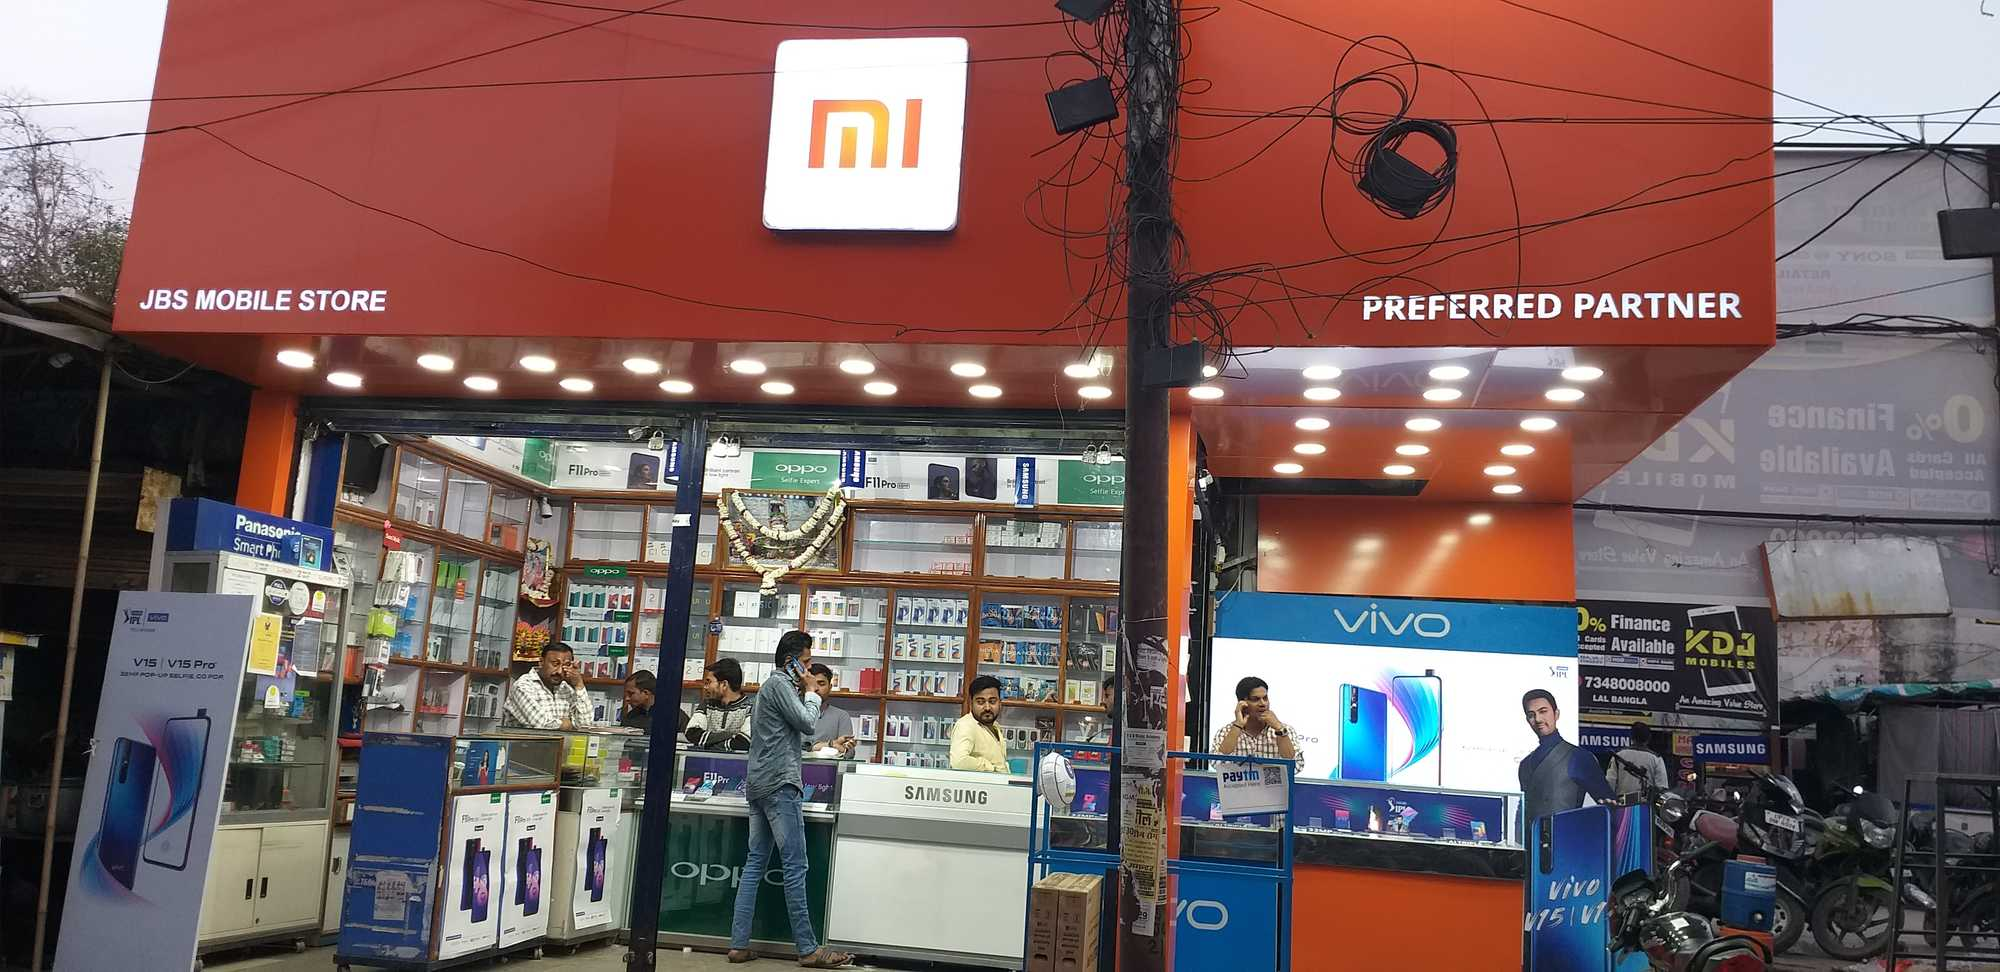 Top Mi Phone Stores in Lal Bangla - Best Mi Mobile Phones